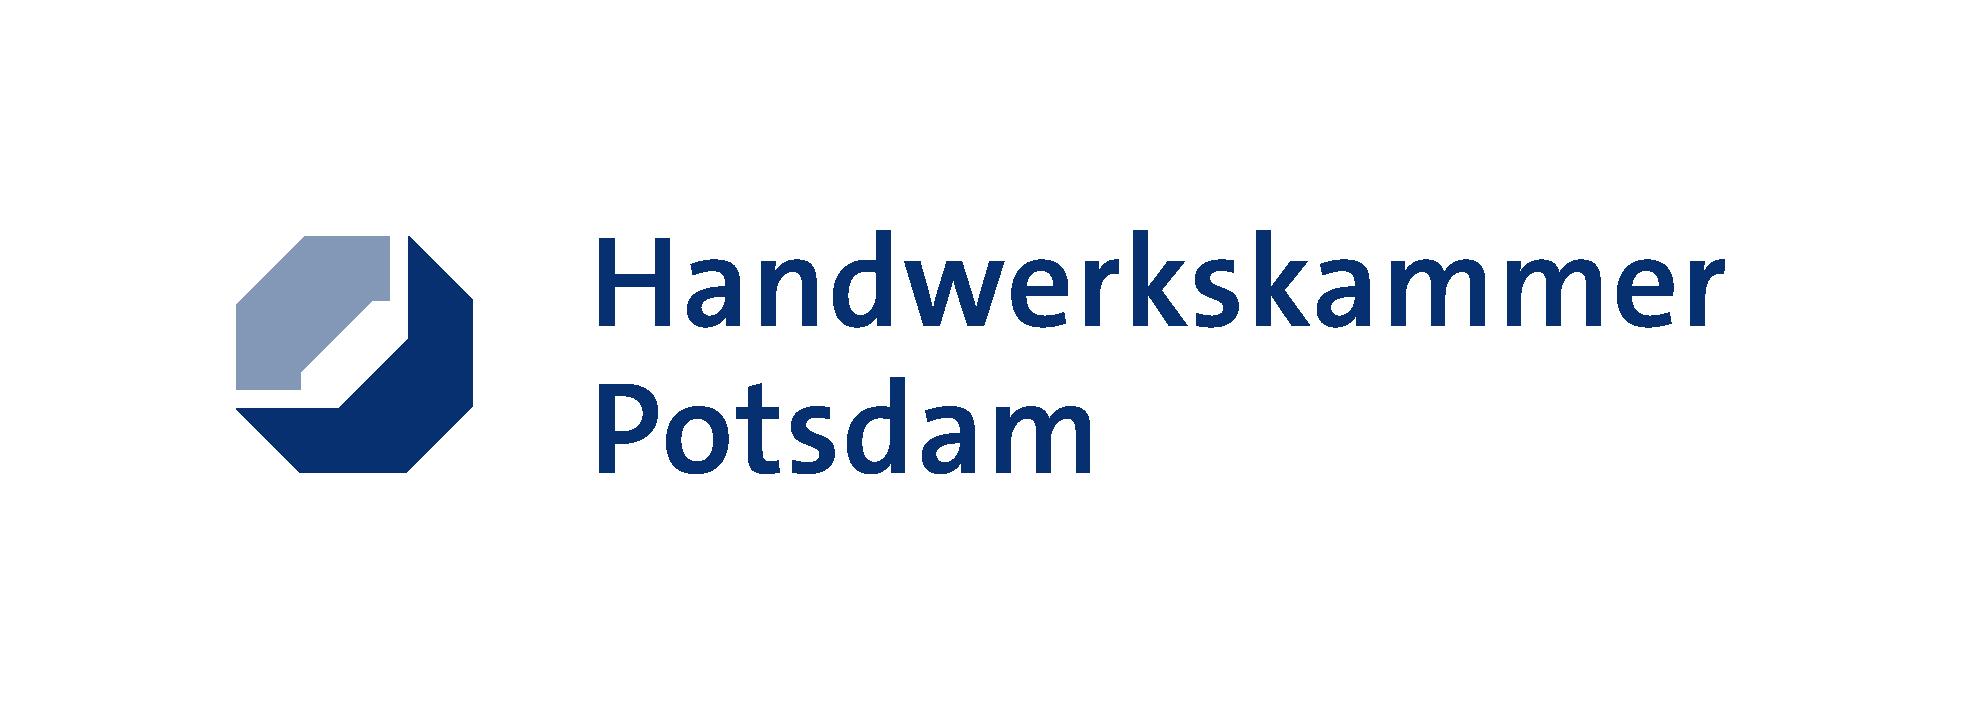 Handwerkskammer Potsdam